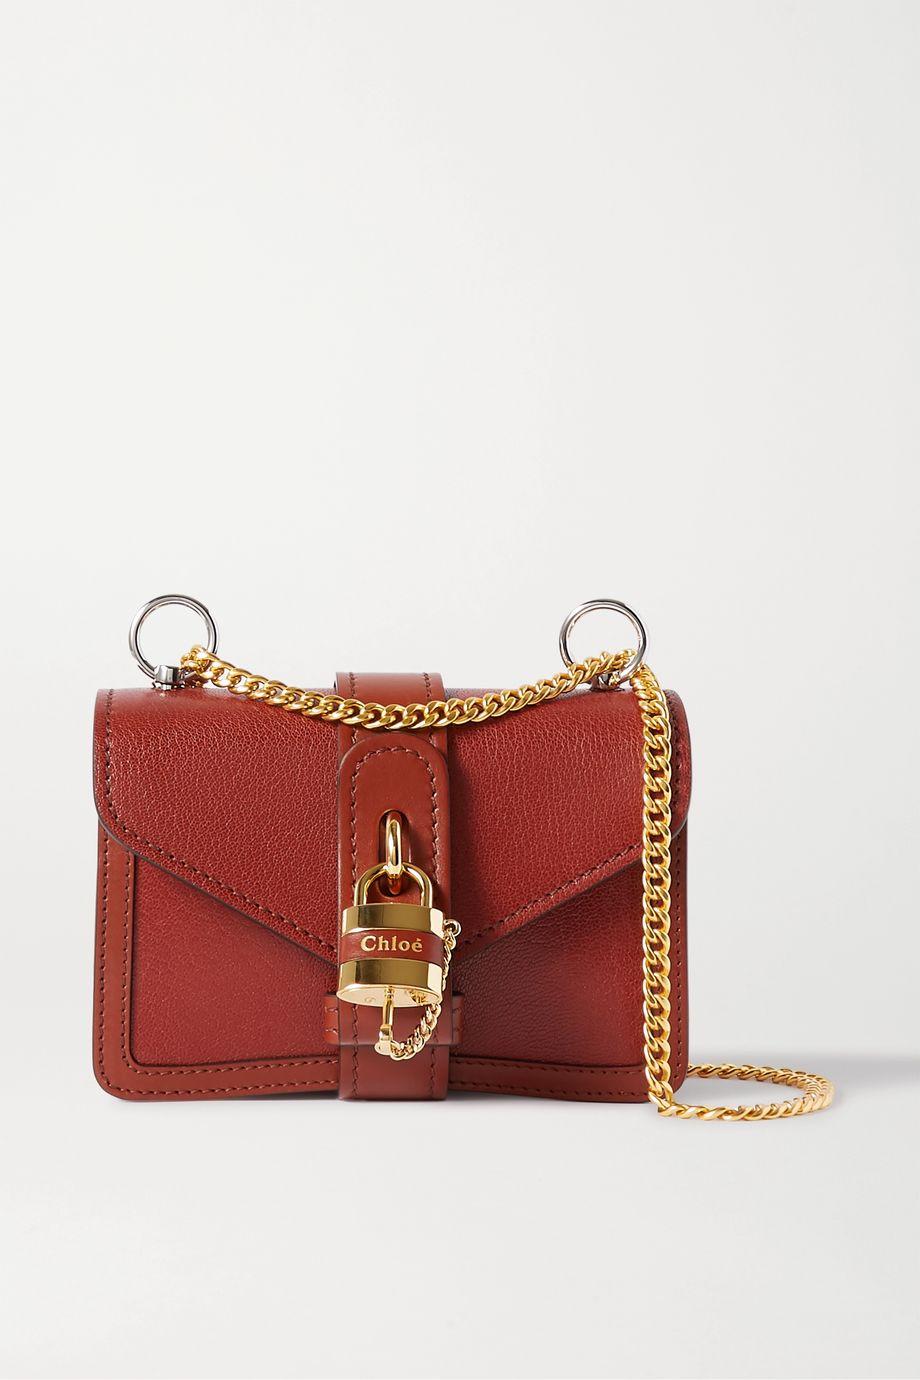 Chloé Sac porté épaule en cuir texturé Aby Chain Mini